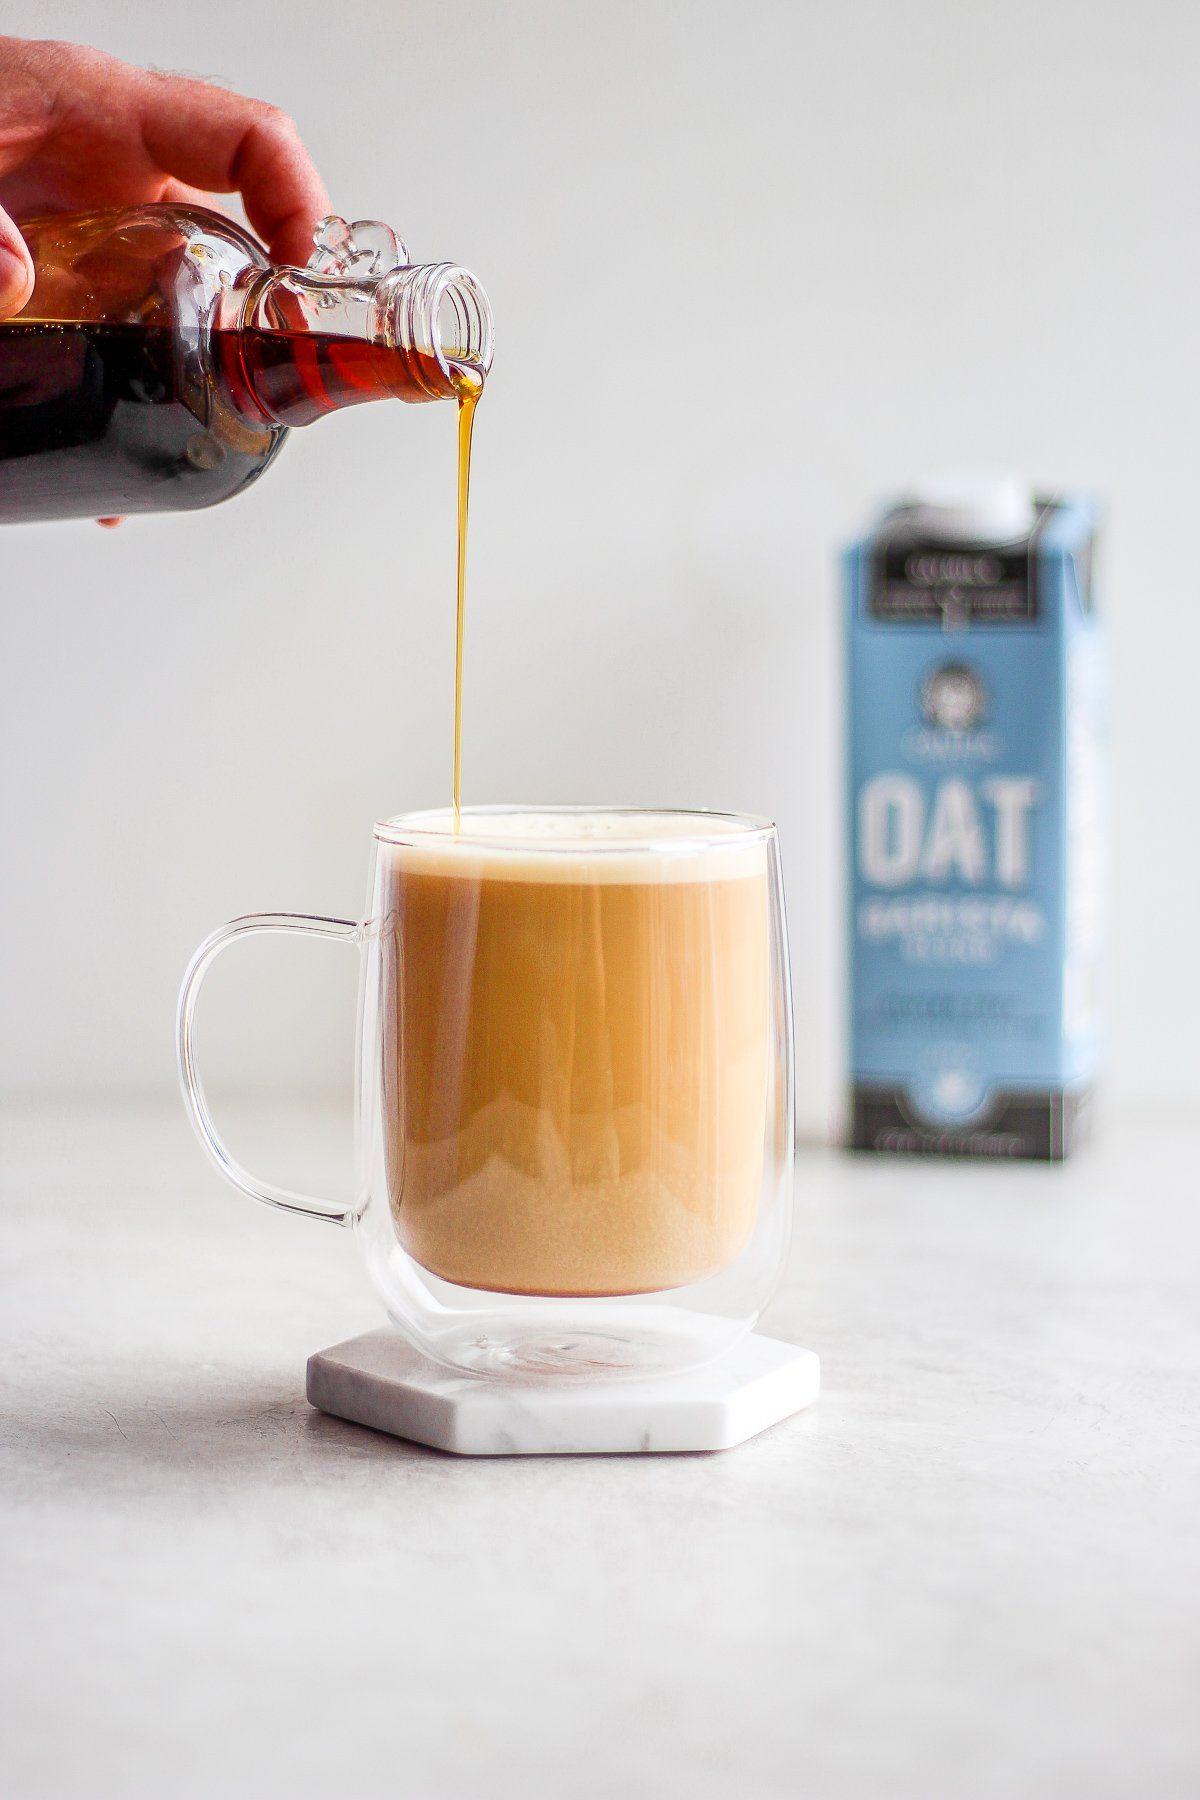 Creamy maple oat latte dairy free coffee dairy free